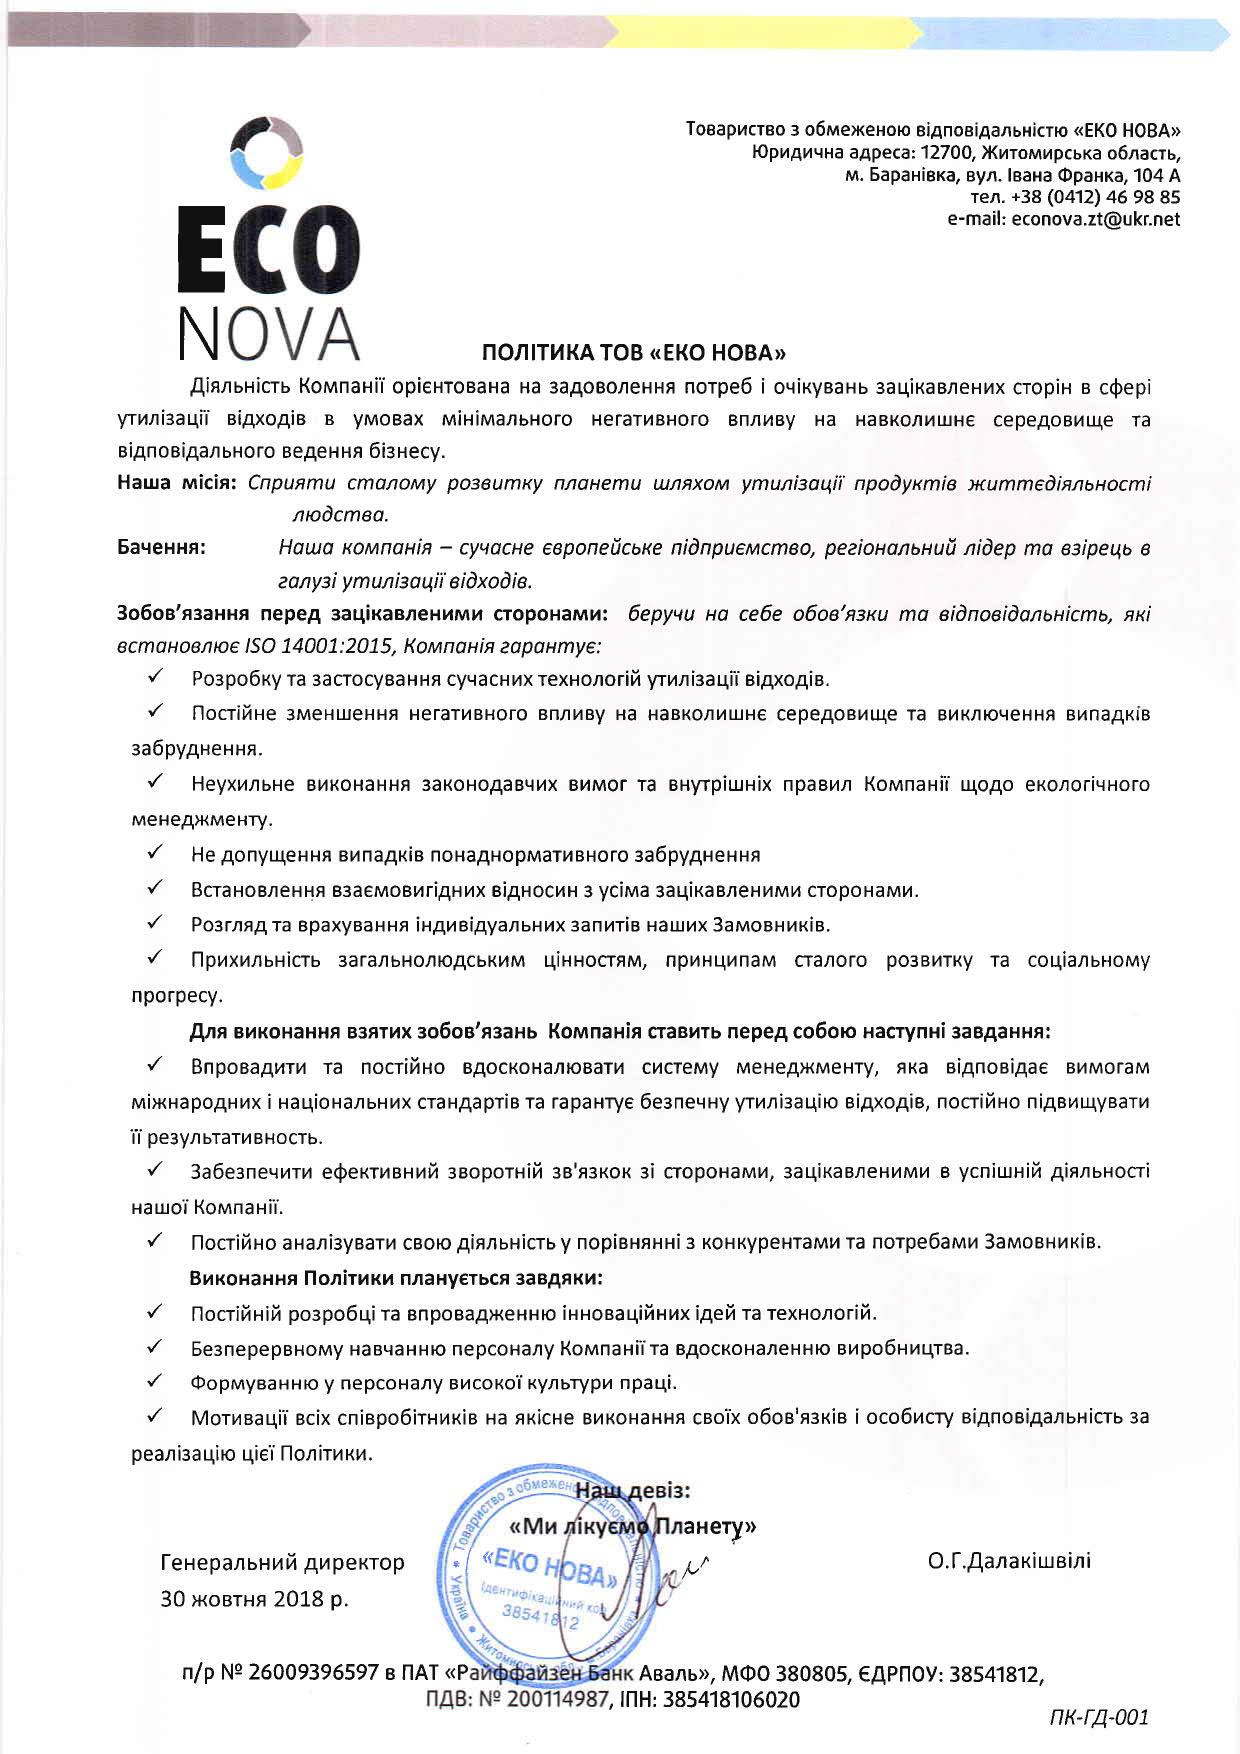 Face_ISO14001_Эко_Нова_1